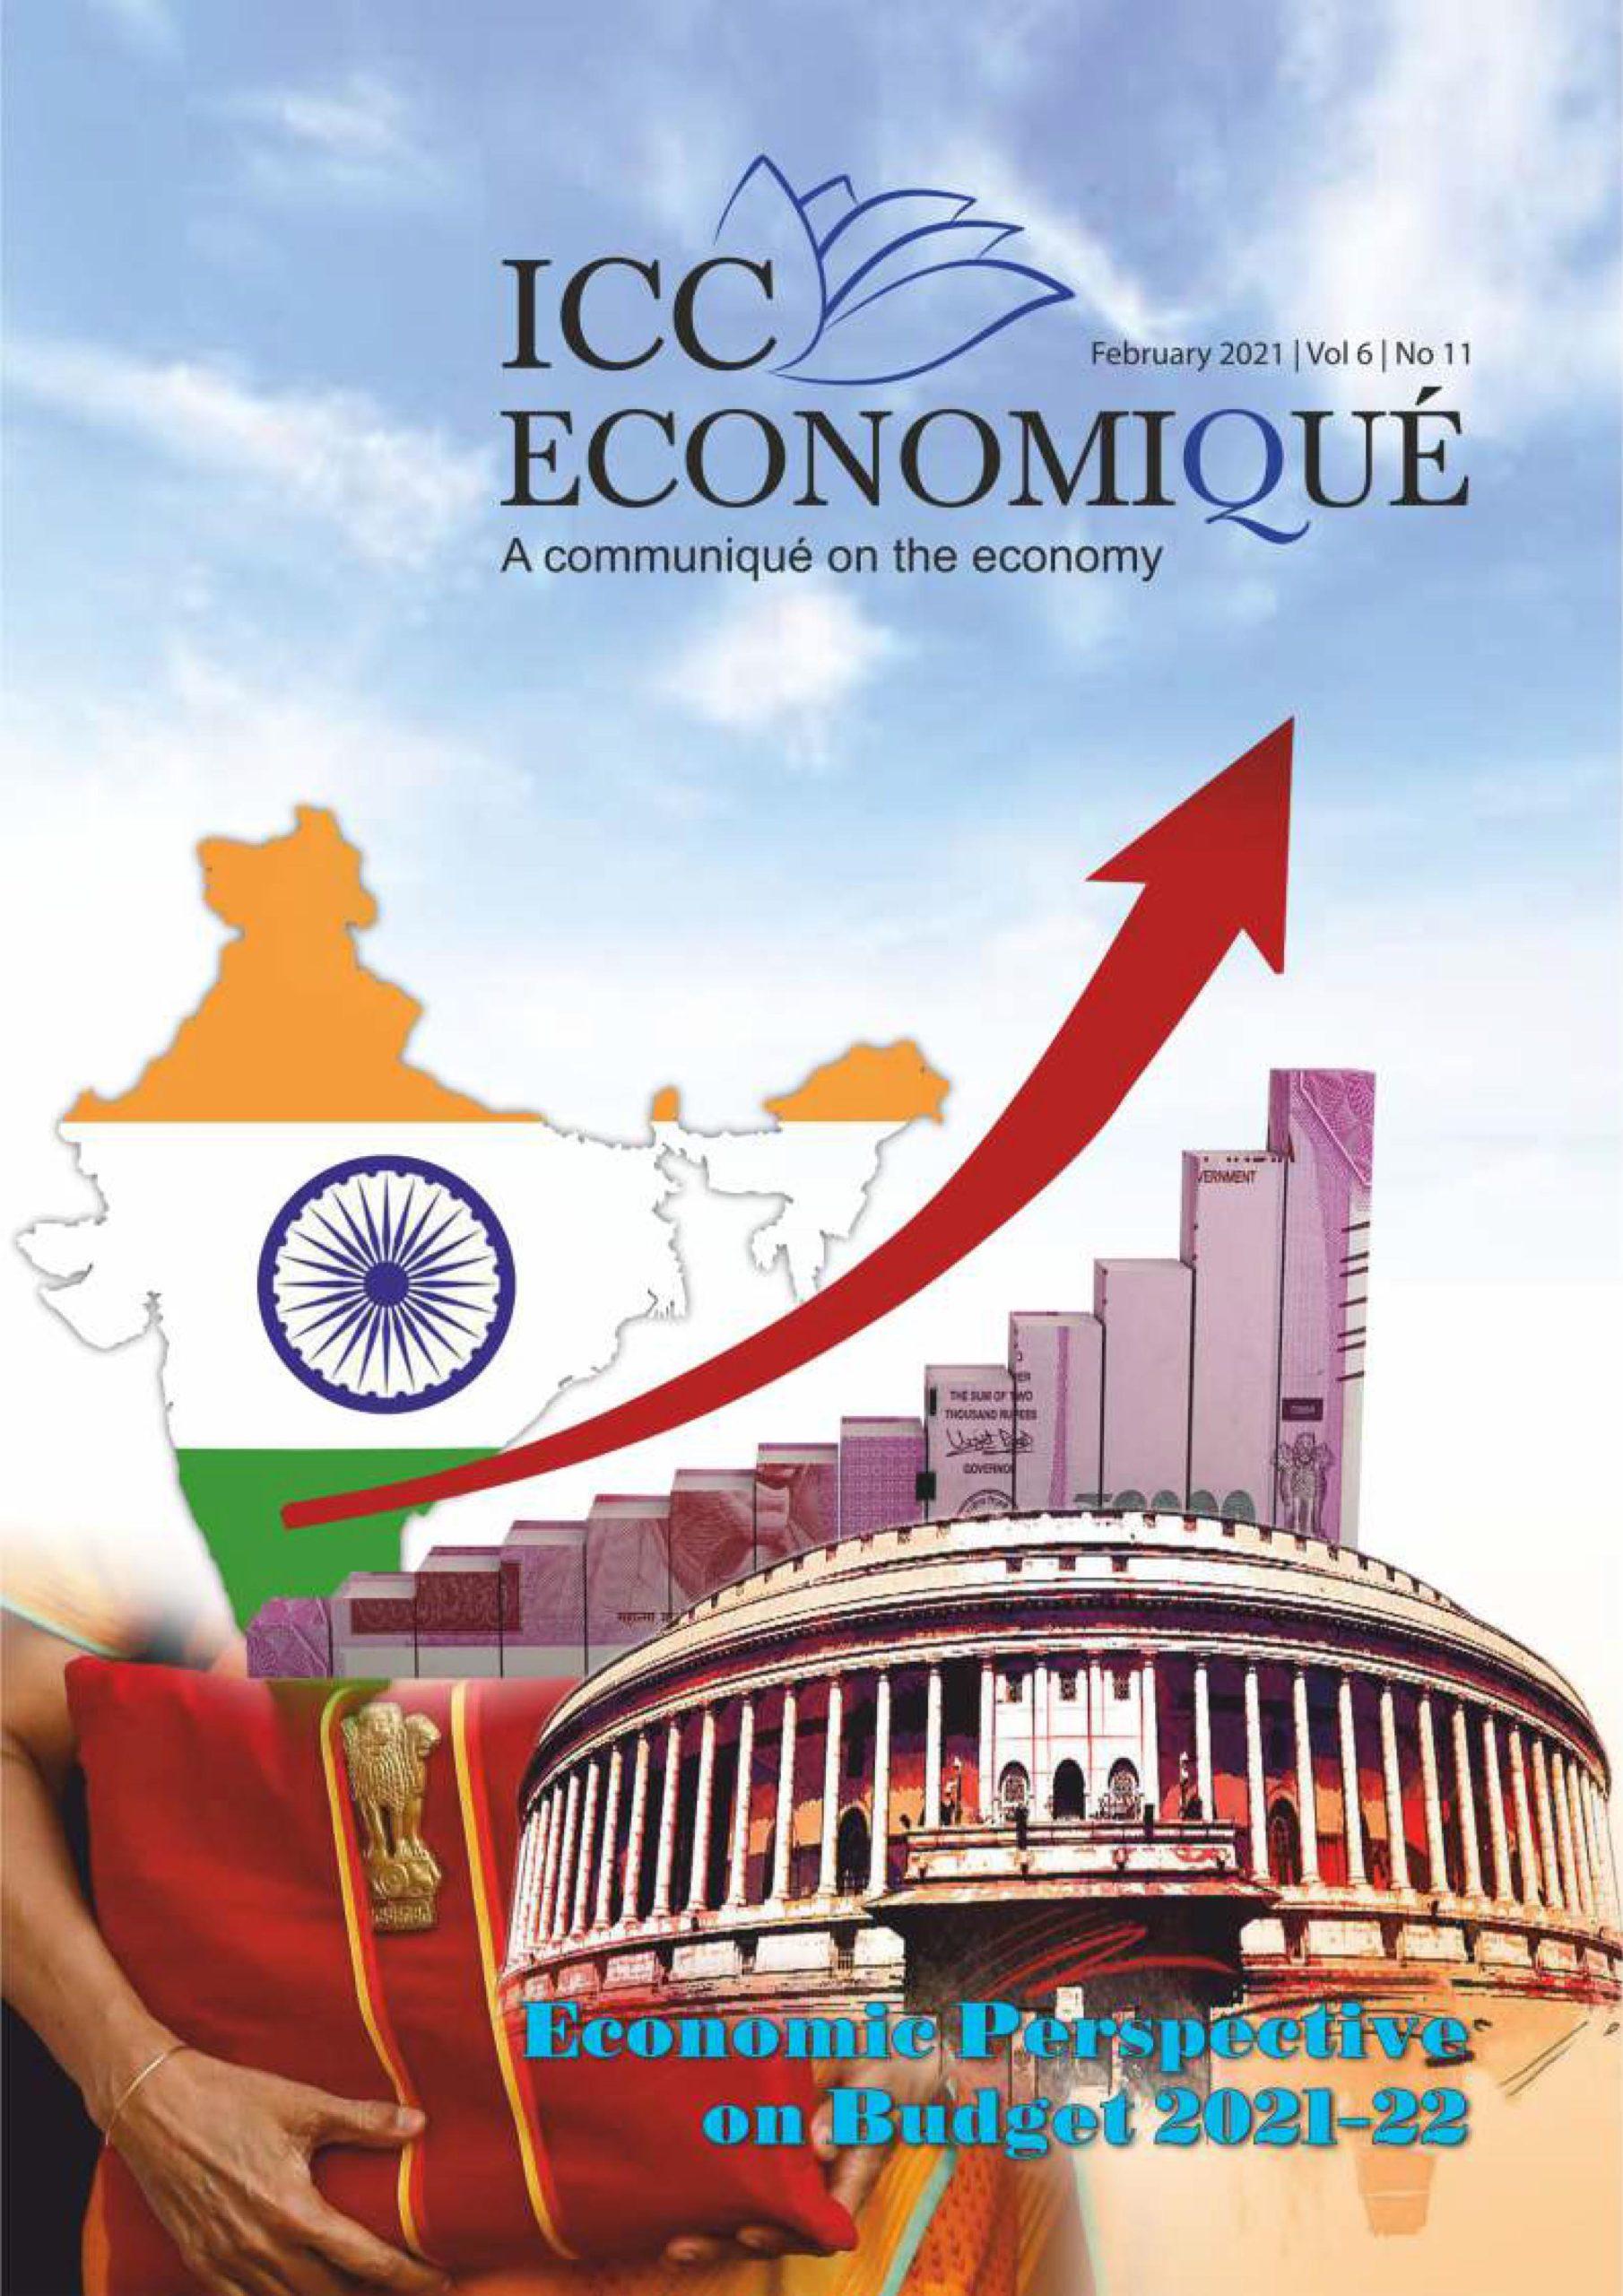 ICC Economique February 2021 | Vol 6 | No 11